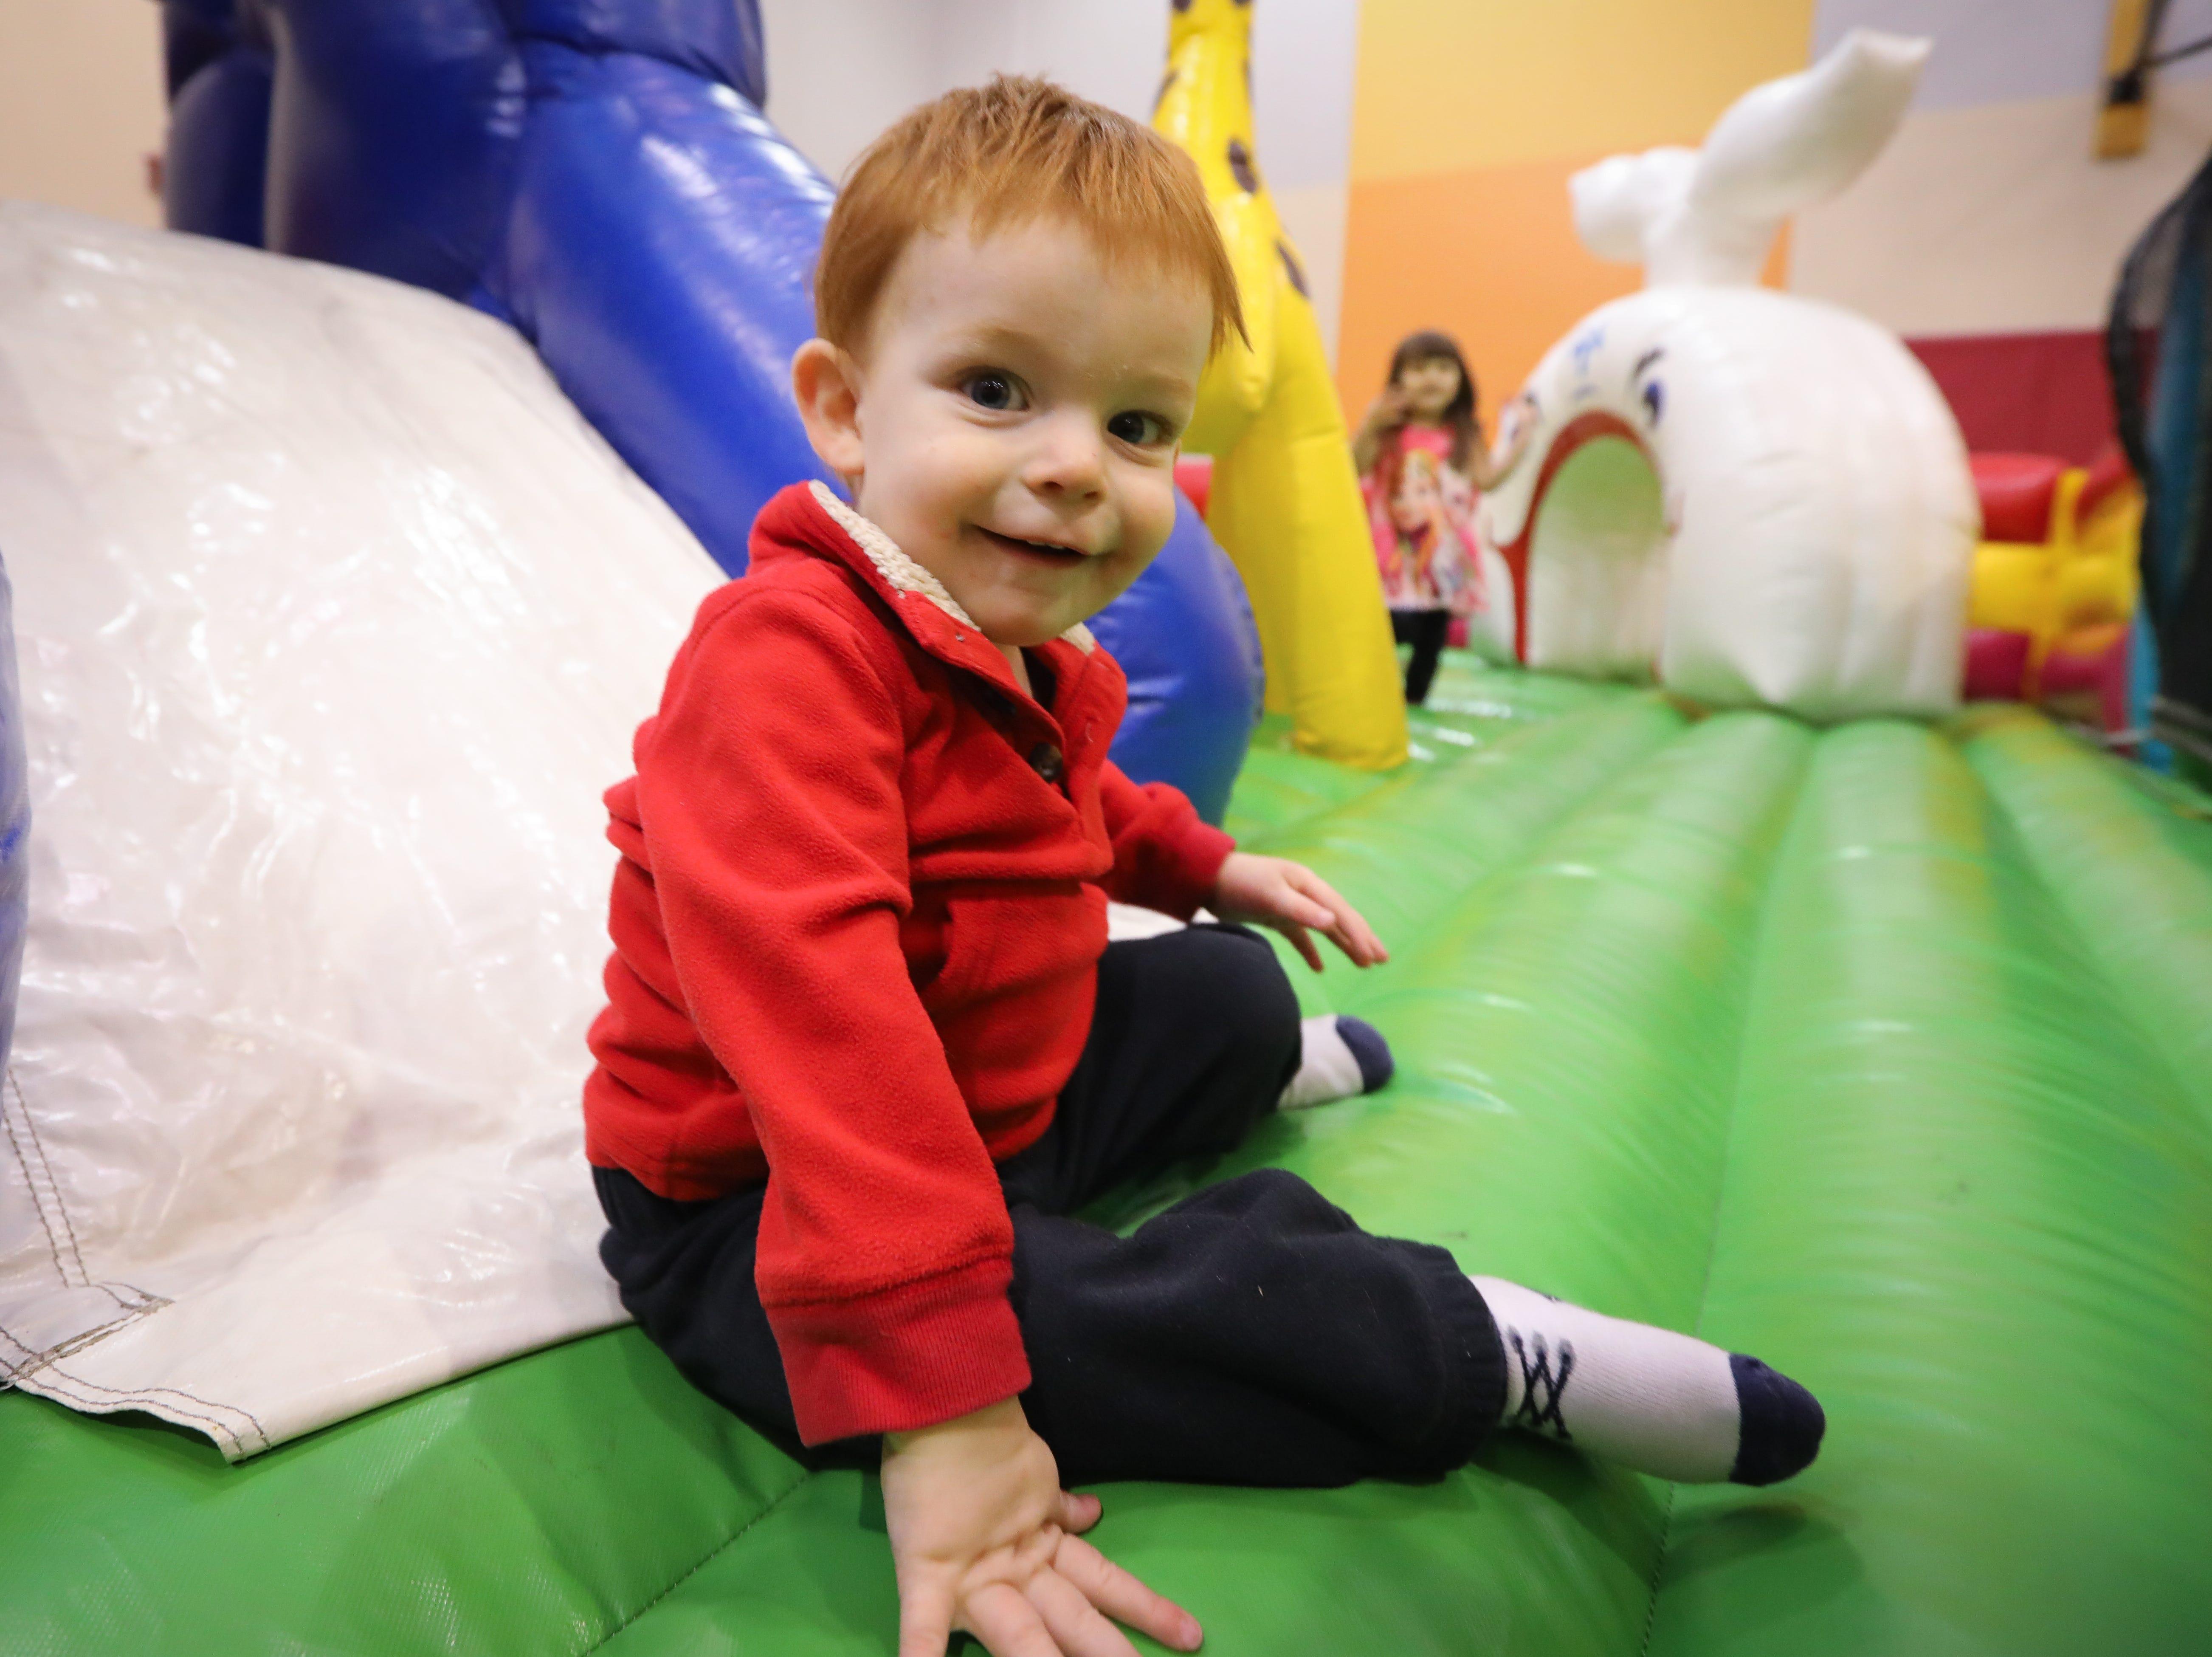 Brogan, 1, of Adel participates in the Preschool Palooza at Hillside Elementary School on Saturday, Nov. 3, 2018 in Des Moines, Iowa.